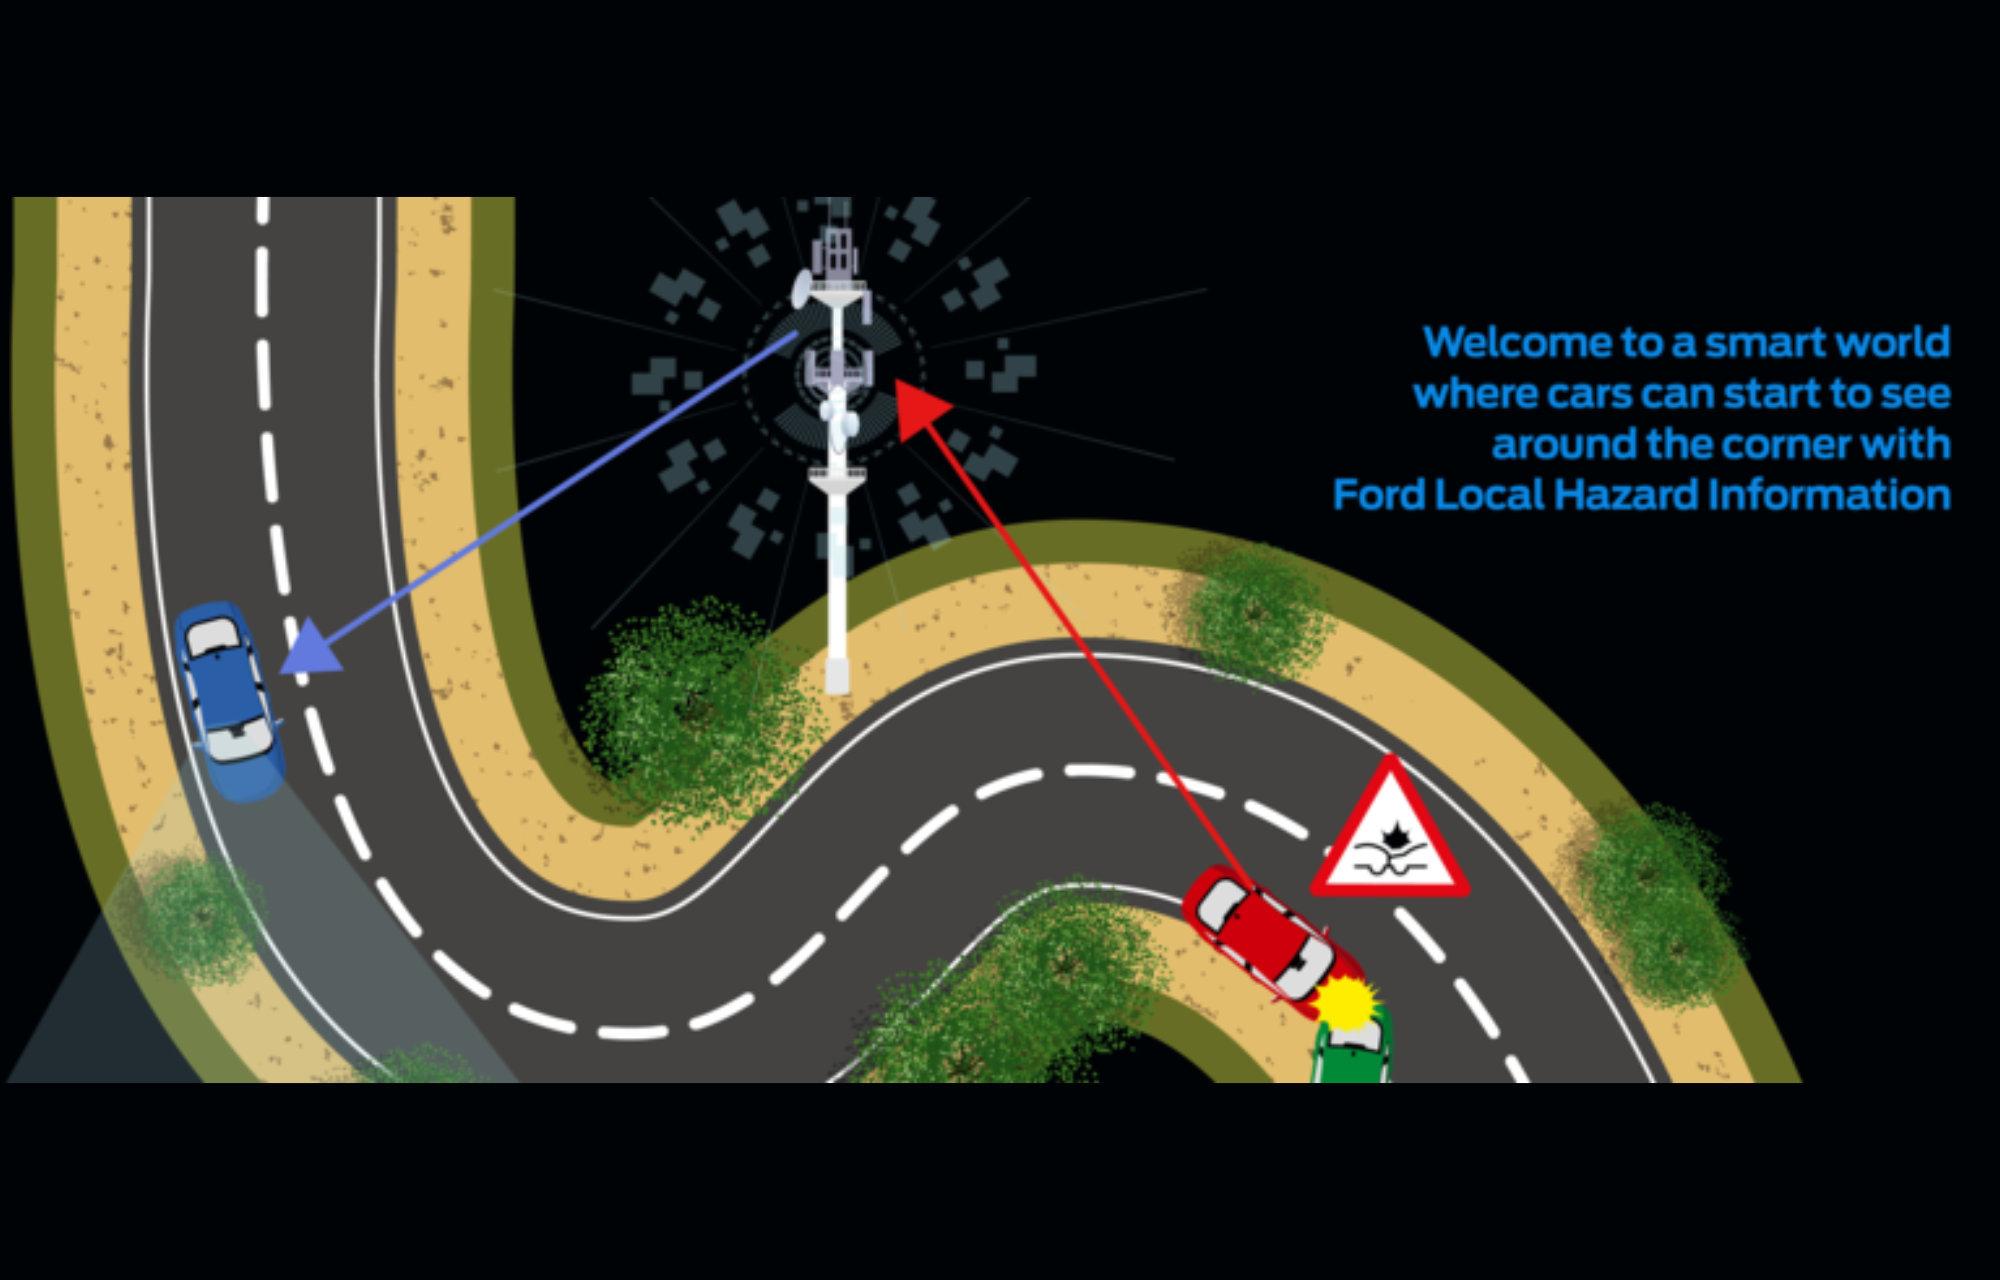 Ford Local Hazardous Information